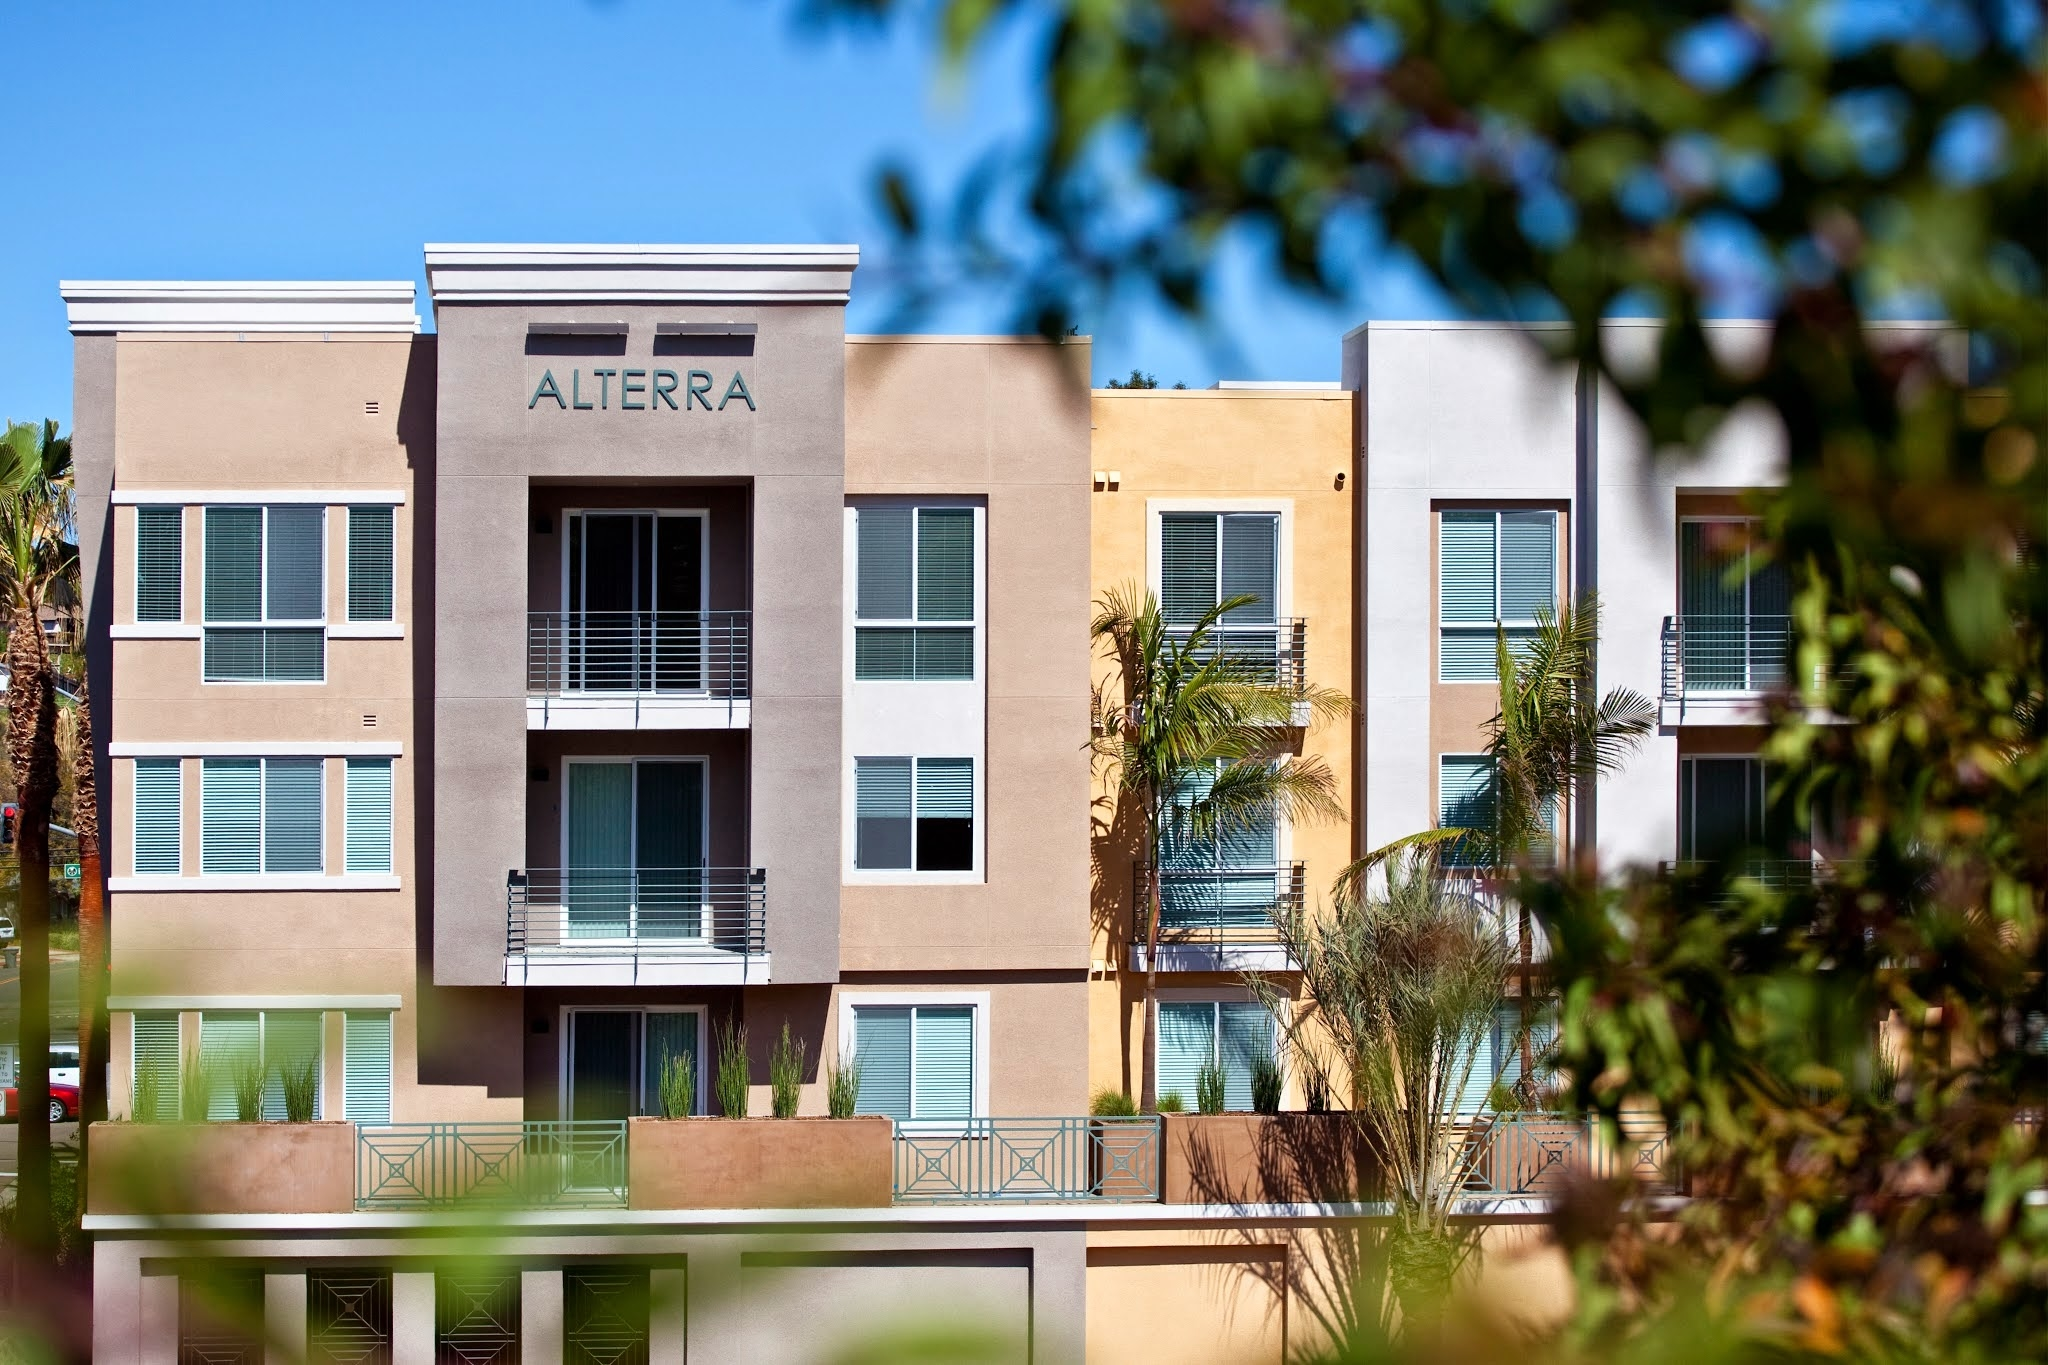 Alterra at Grossmont Trolley Apartments 8727 Fletcher Pkwy La Mesa